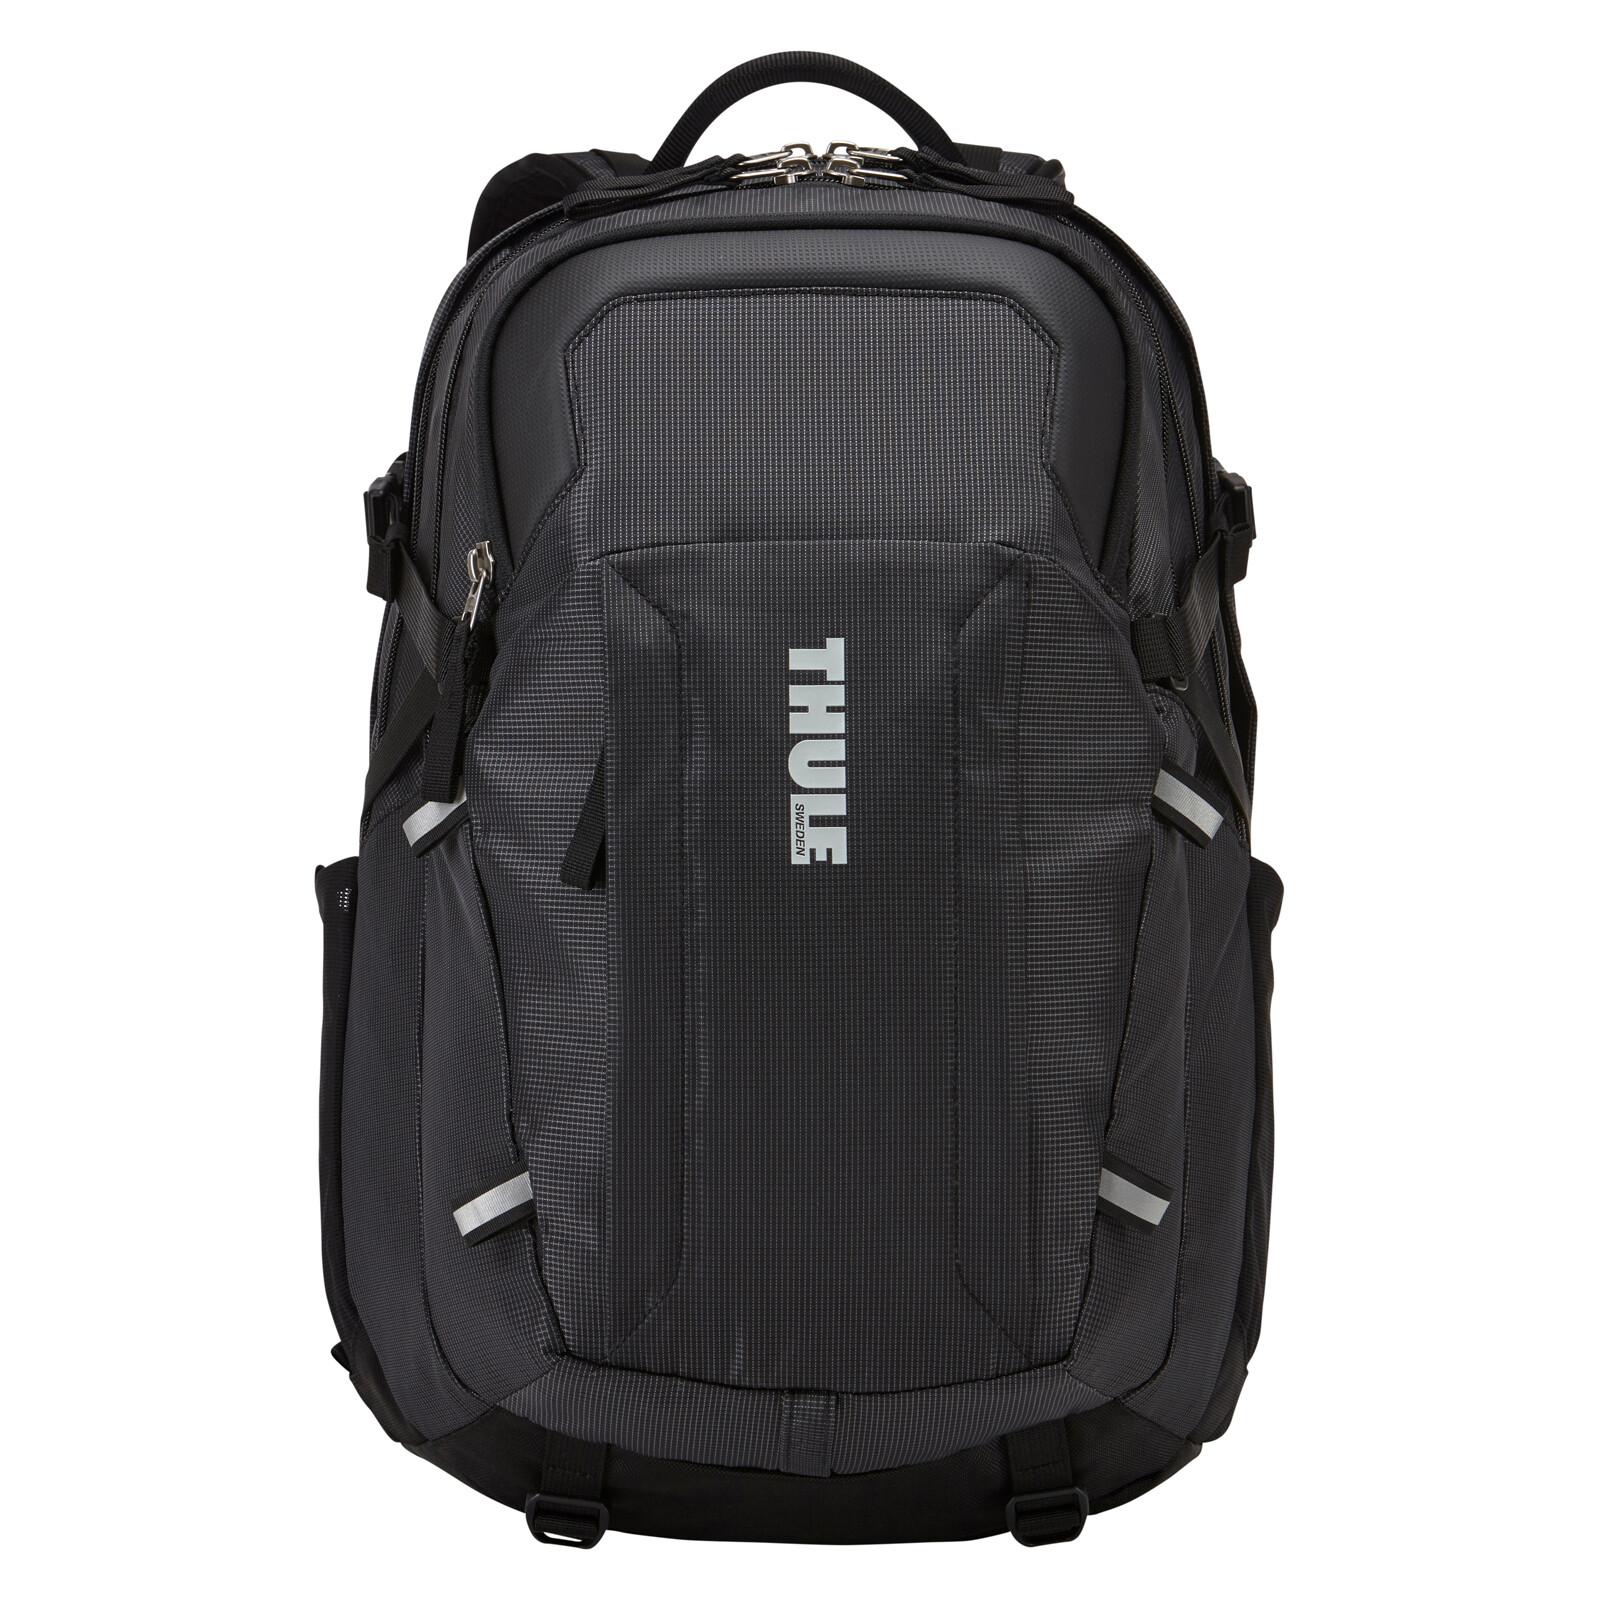 "Thule Enroute 2 Escort 15"" Daypack Black"